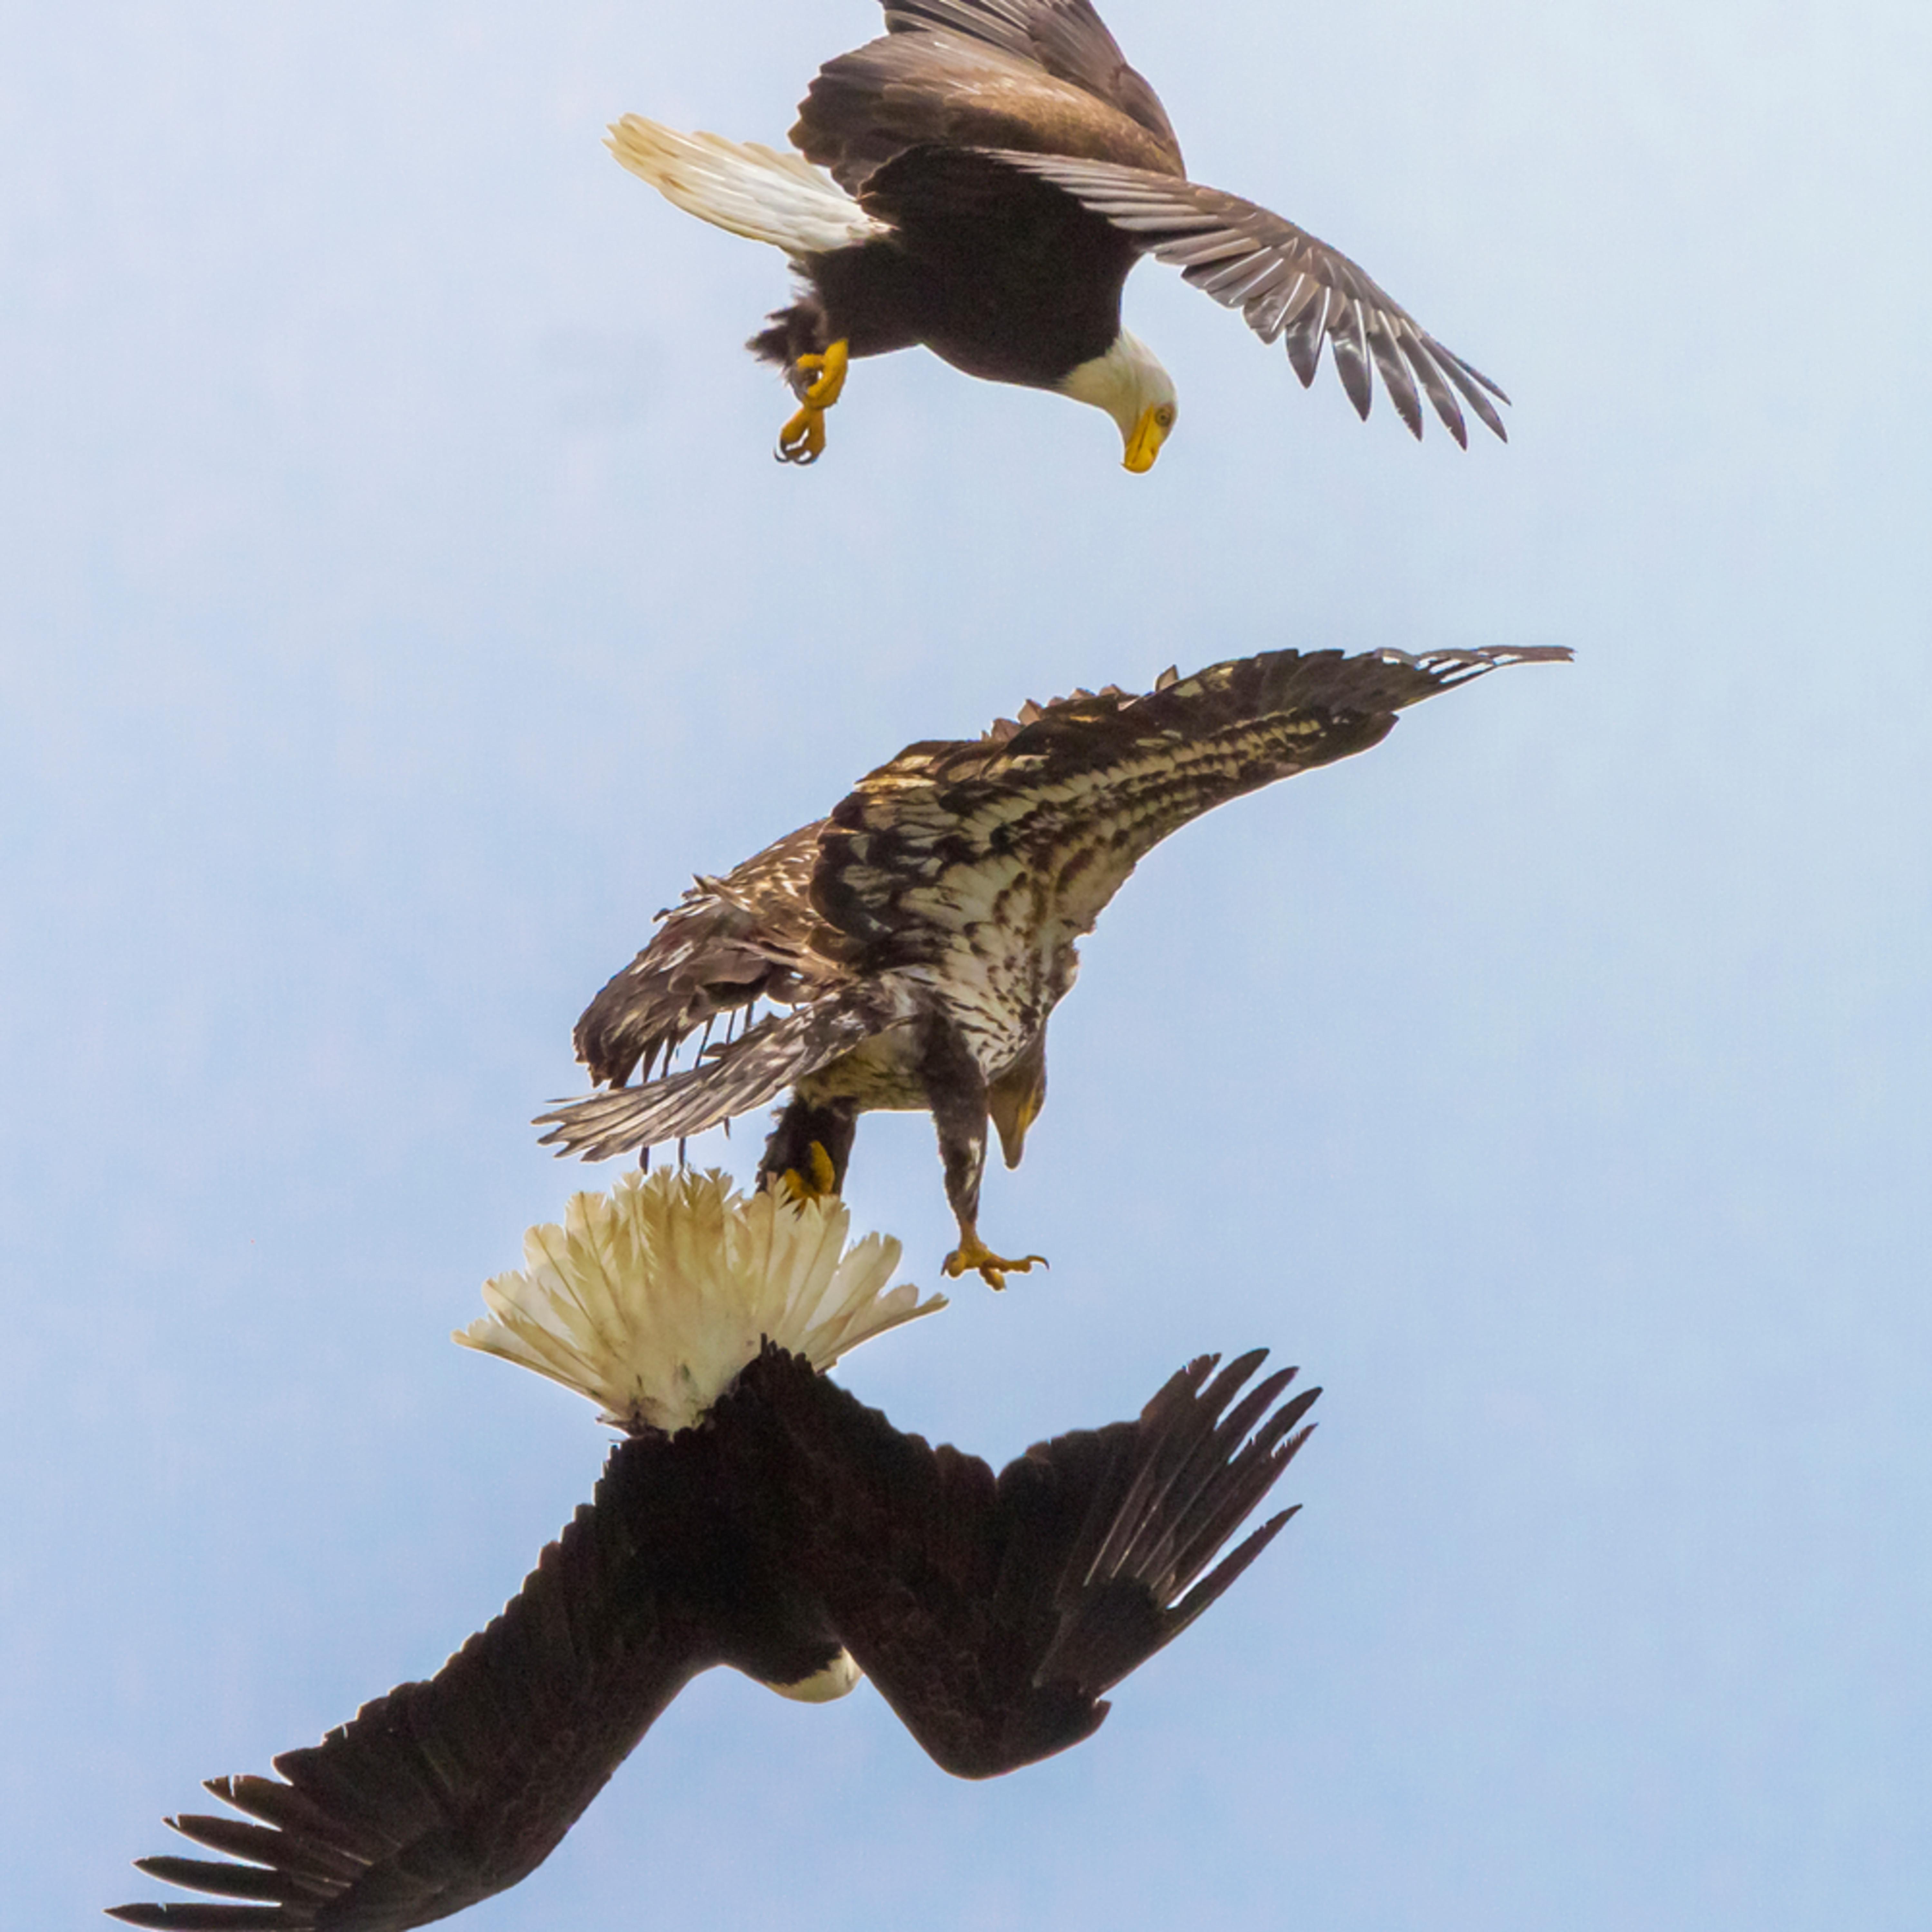 2010 may eagle invasion 0410 asf final n1rf0e